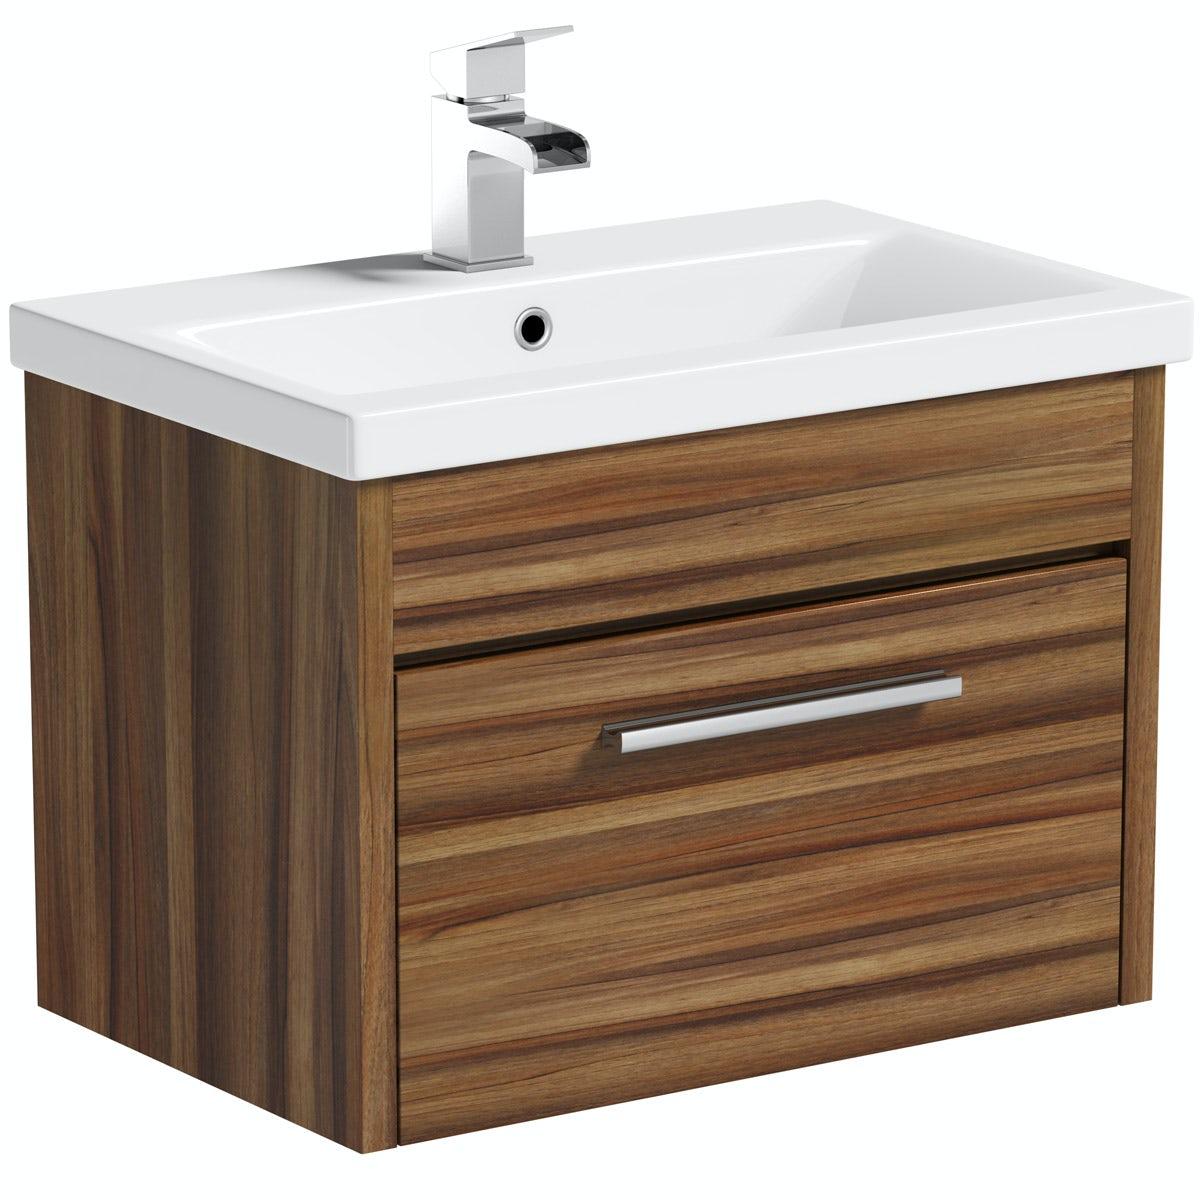 Walnut bathroom furniture - Free Delivery Clarity Walnut Wall Hung Drawer Unit 600mm